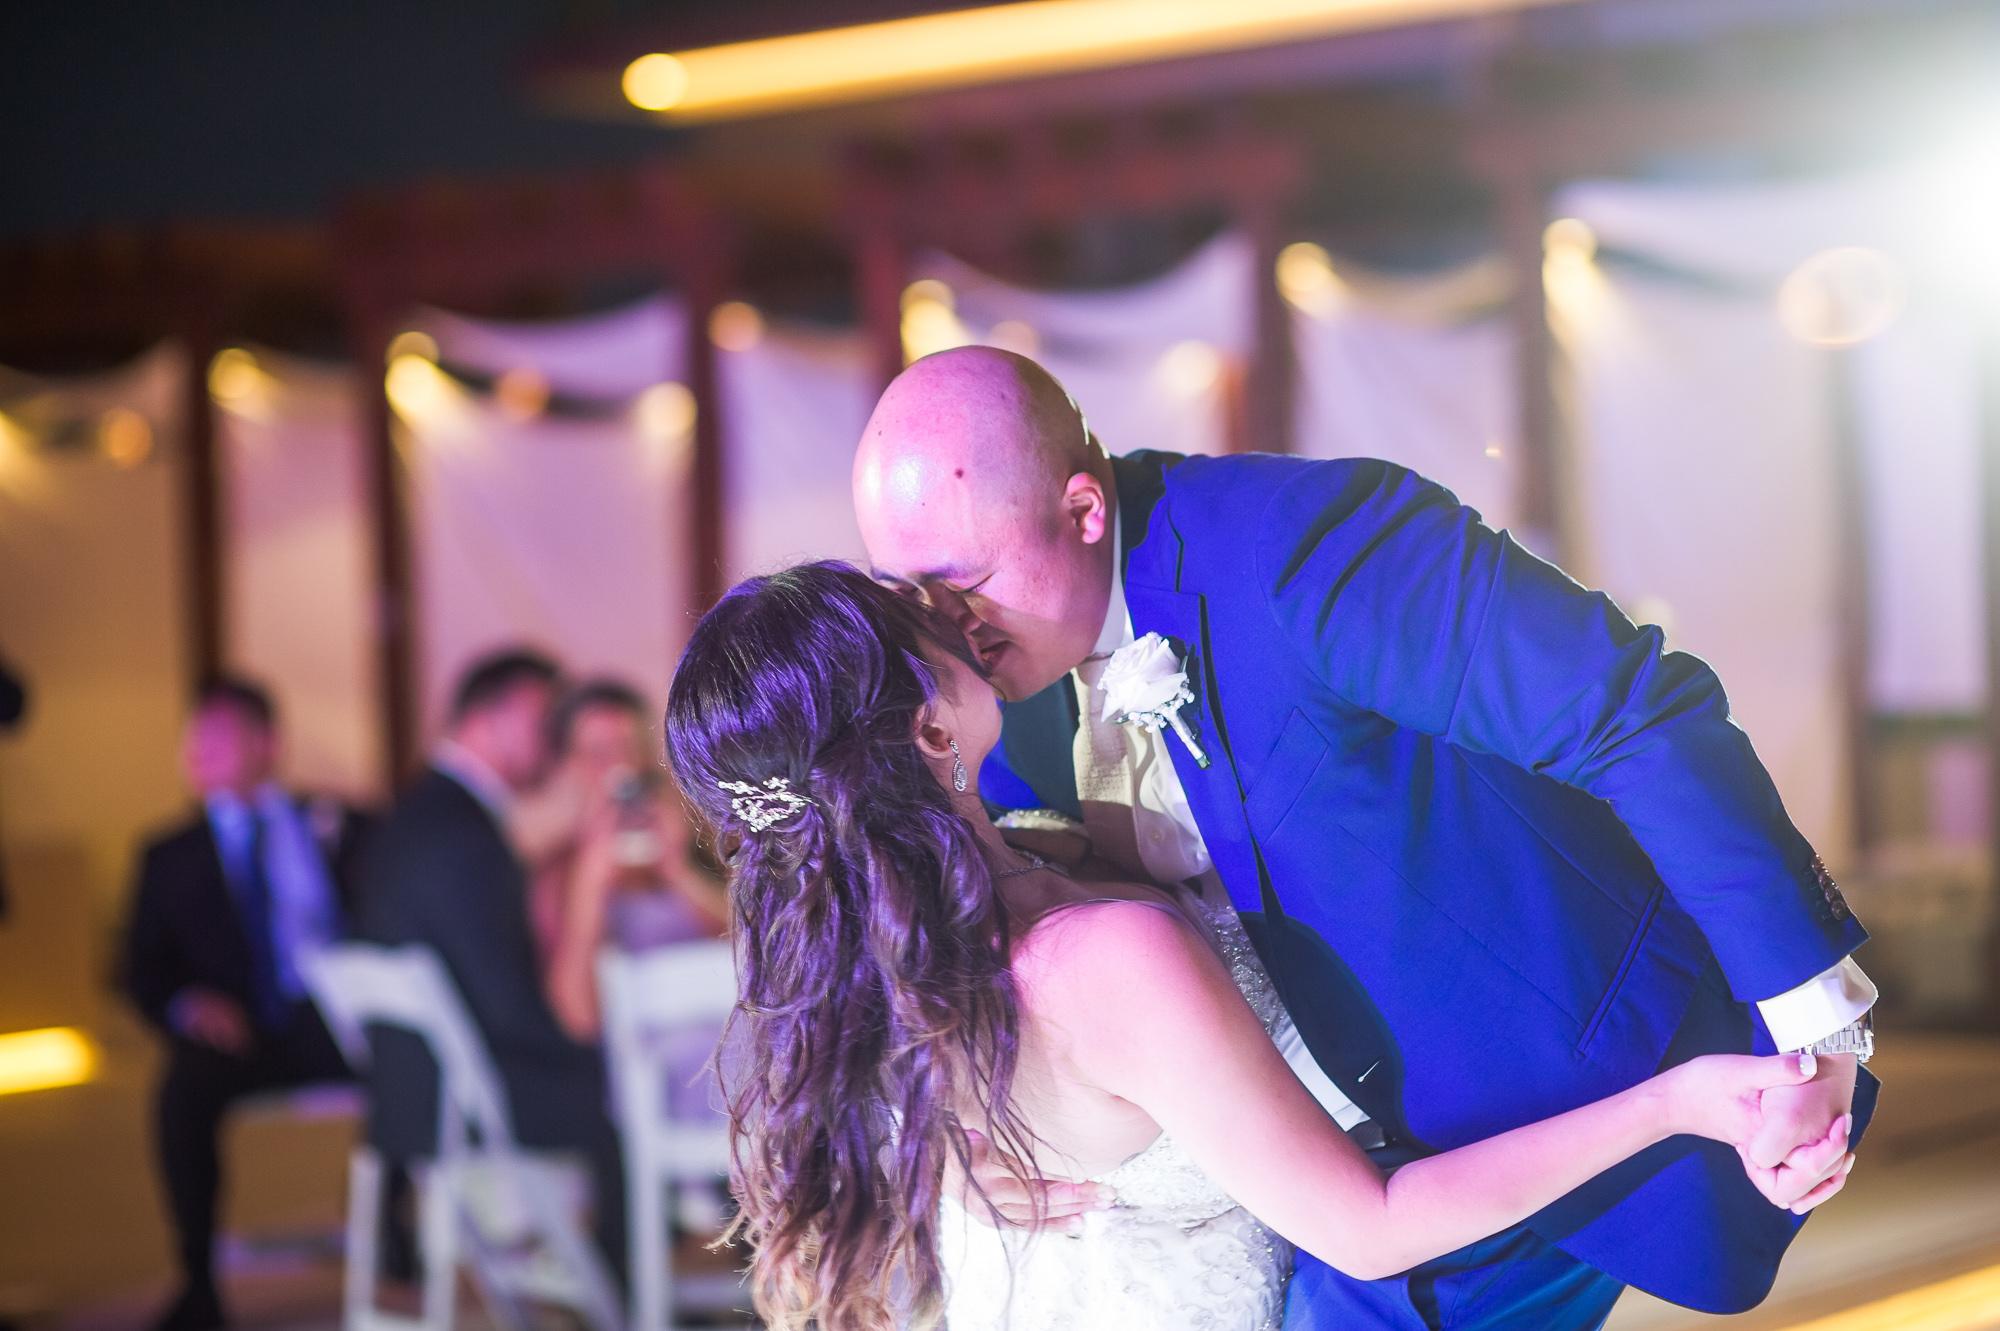 37-David Loi Studios - Cancun - Mexico - Destination Wedding-15833.jpg